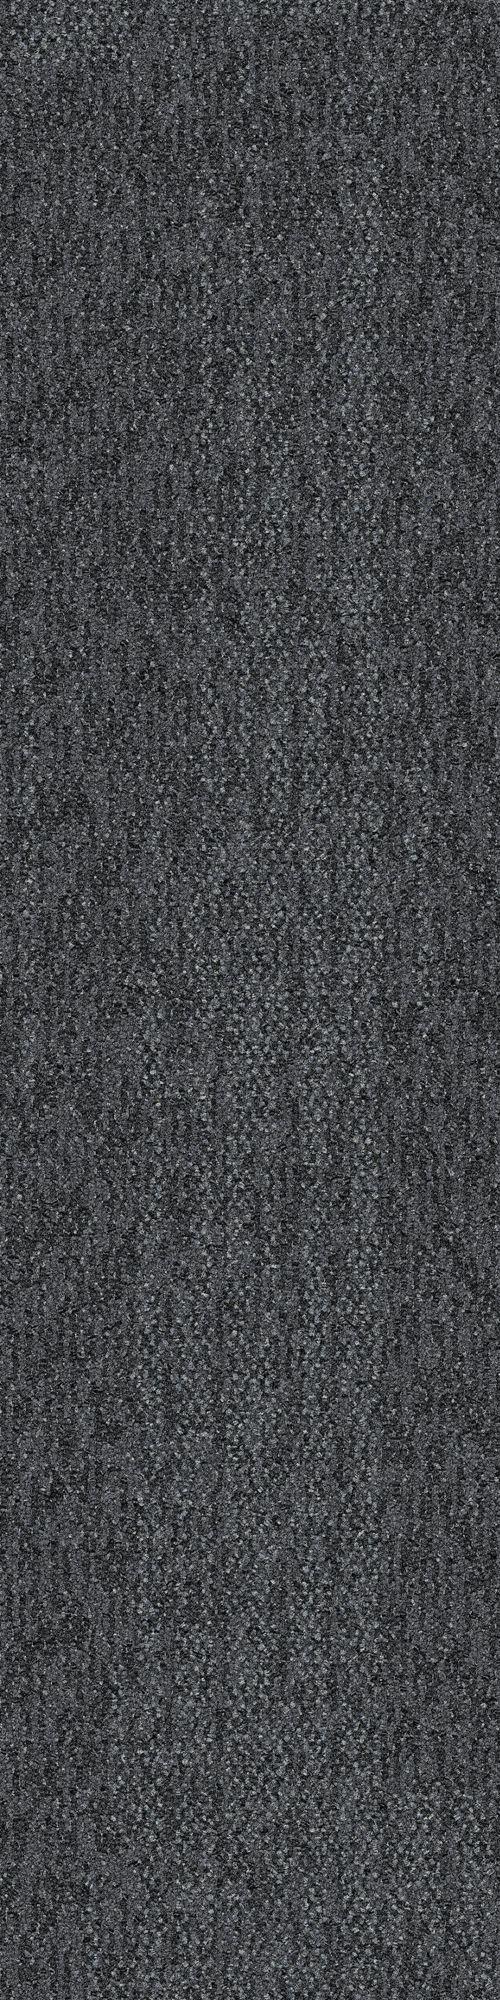 Interface carpet tile: Riverside Color name: Pier